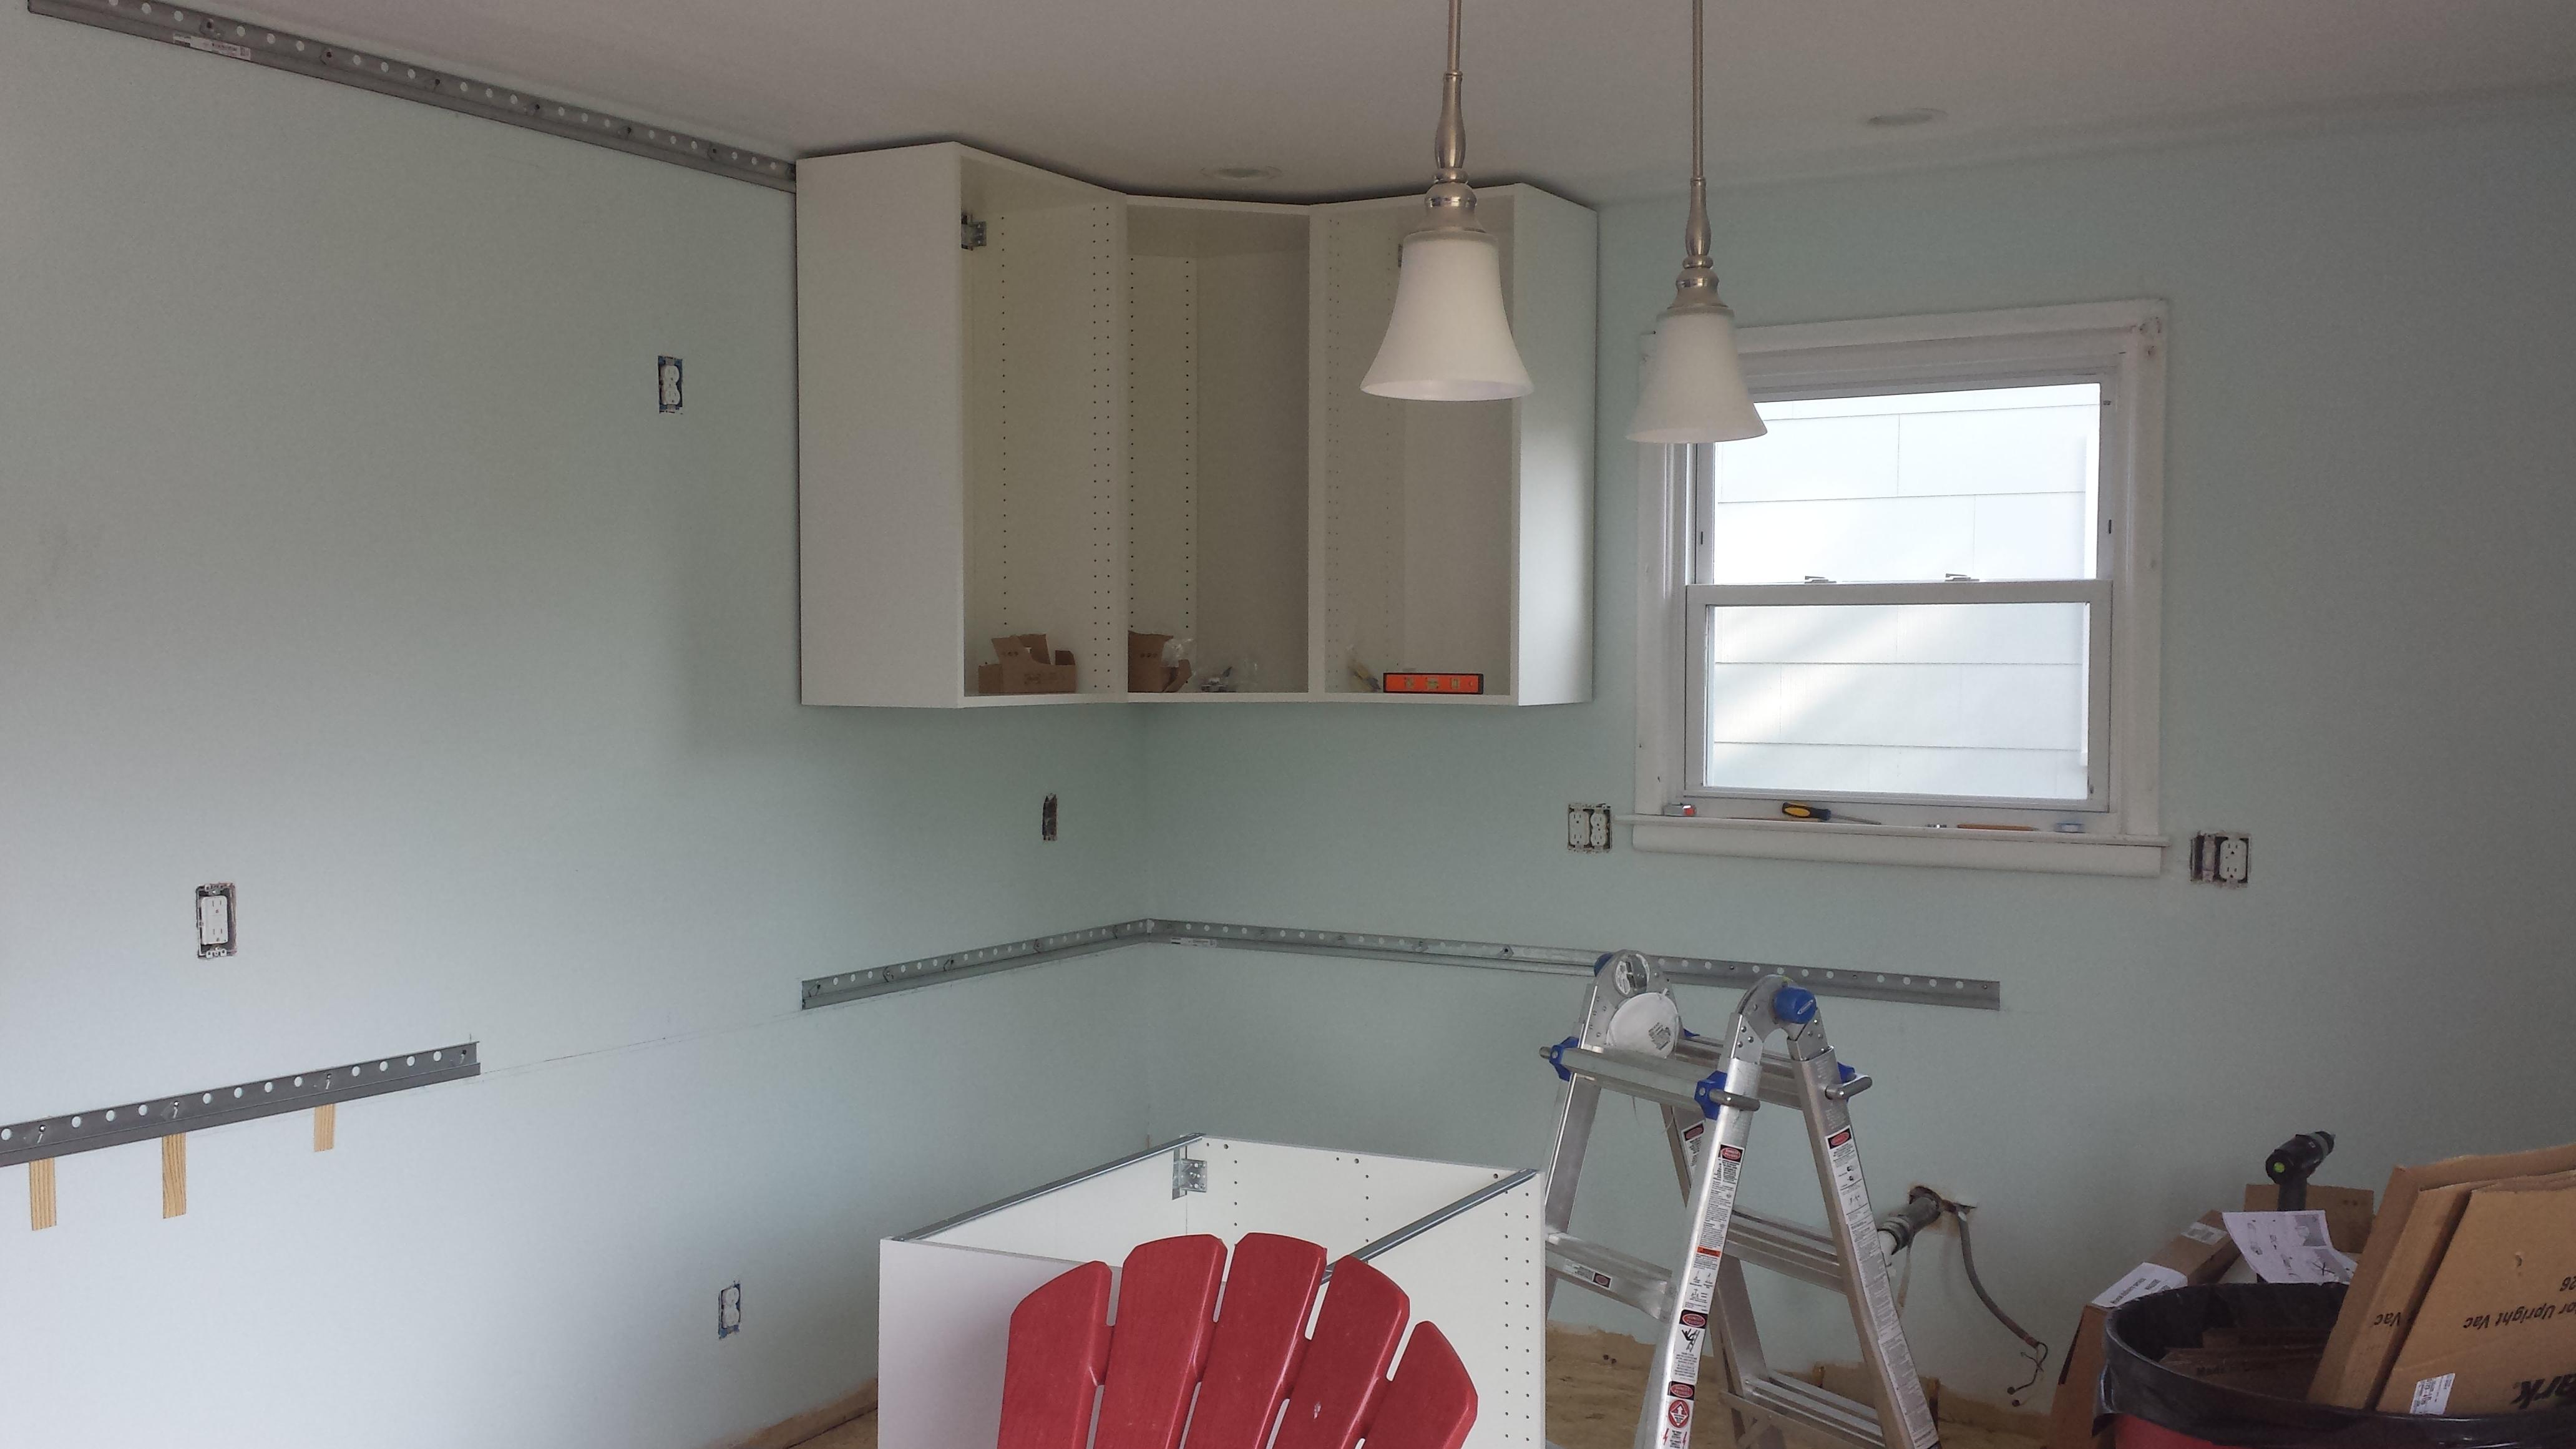 ikea kitchen cabinet installation wall decor ideas  round 2 hanging cabinets